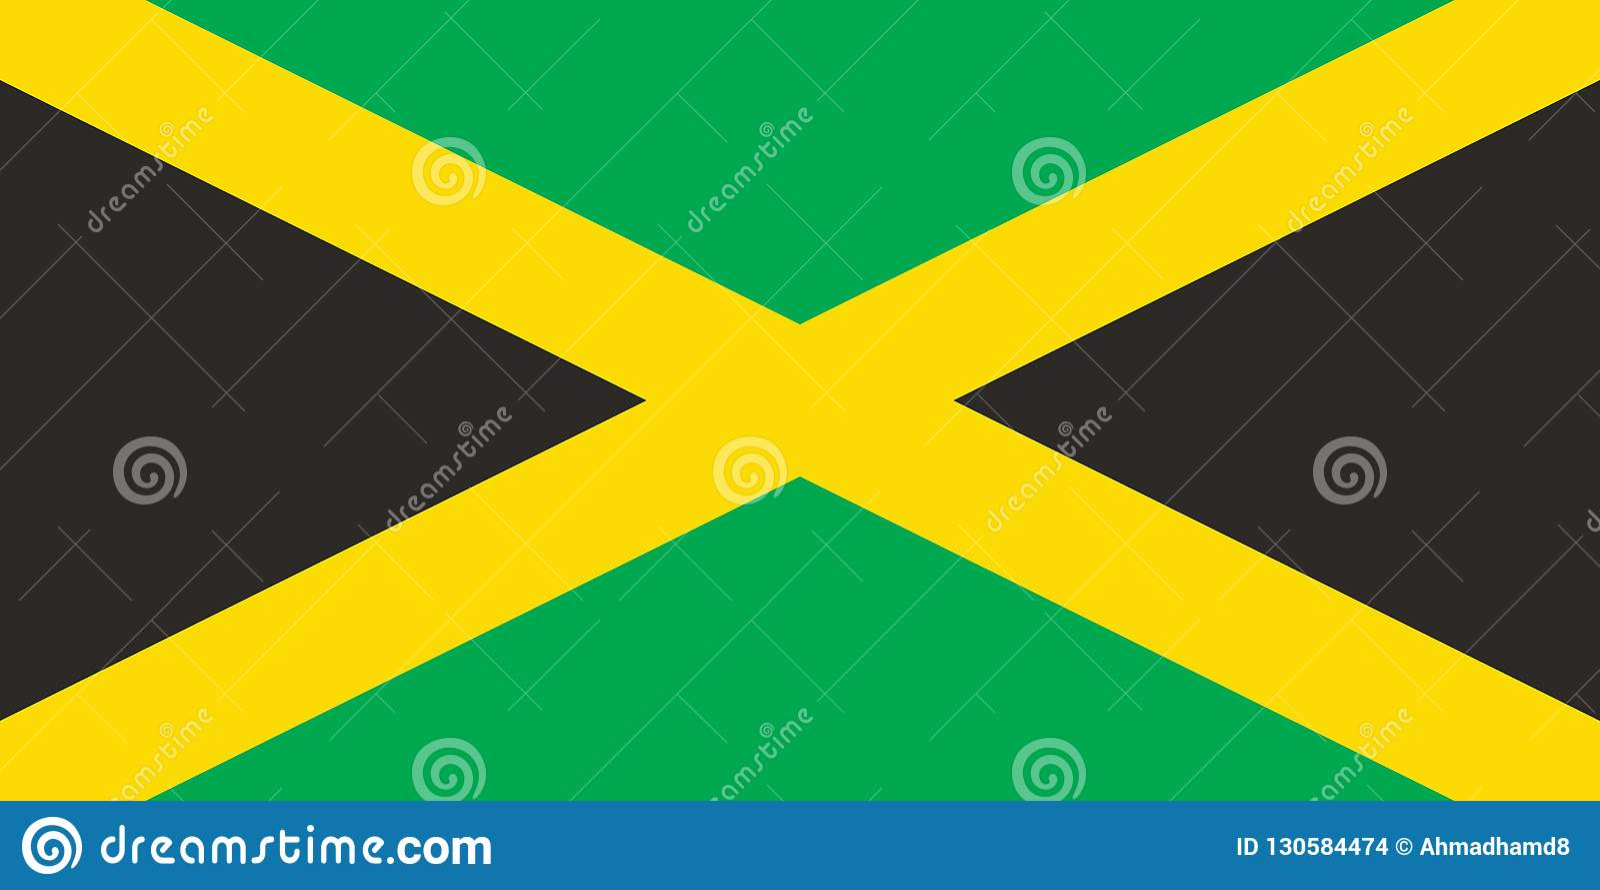 Vektor-Bild von Jamaika-Flagge, Illustration